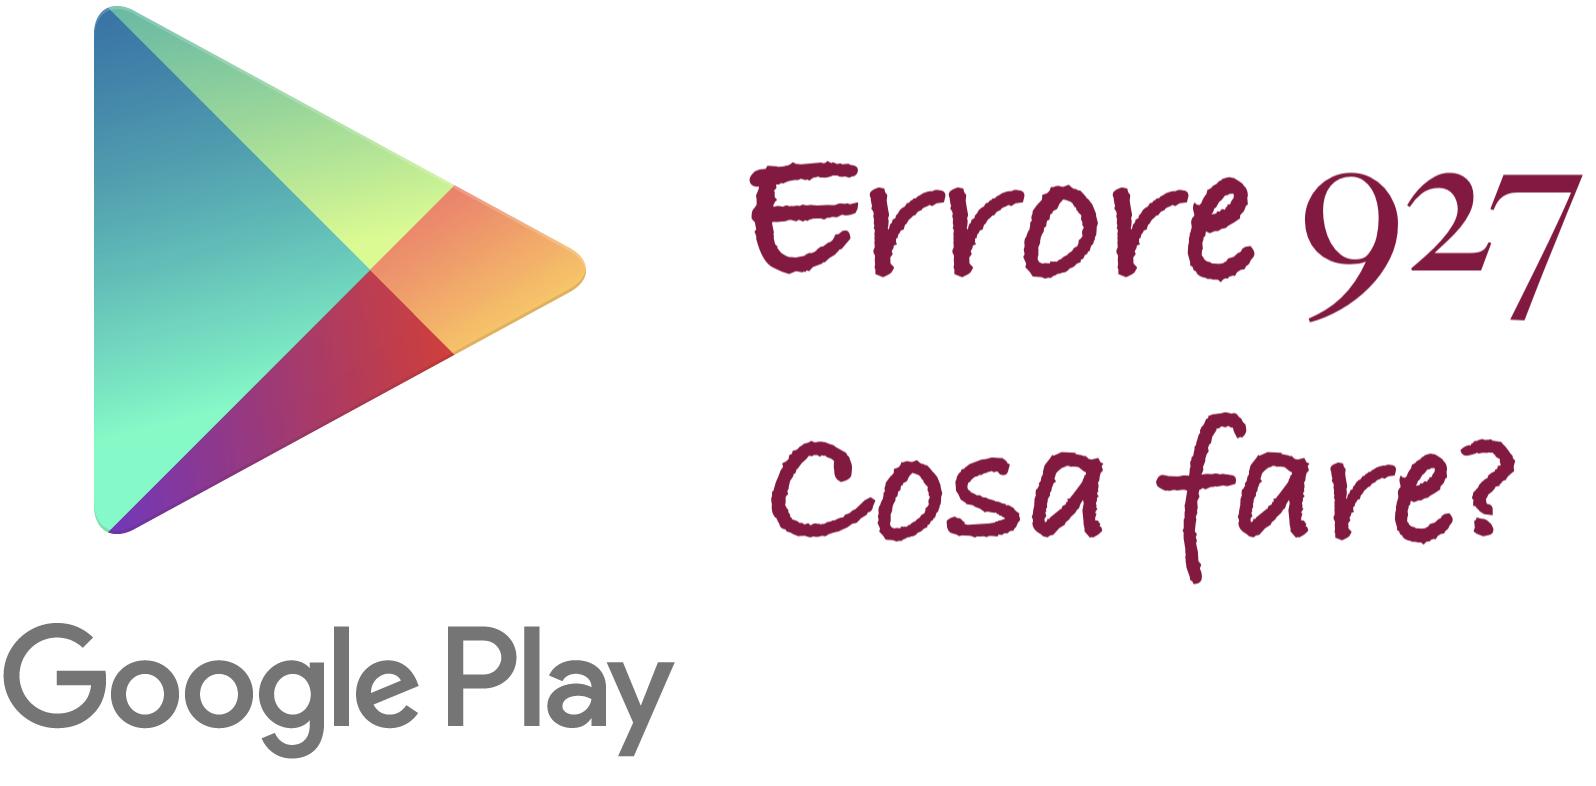 Errore 927 su Google Play store logo